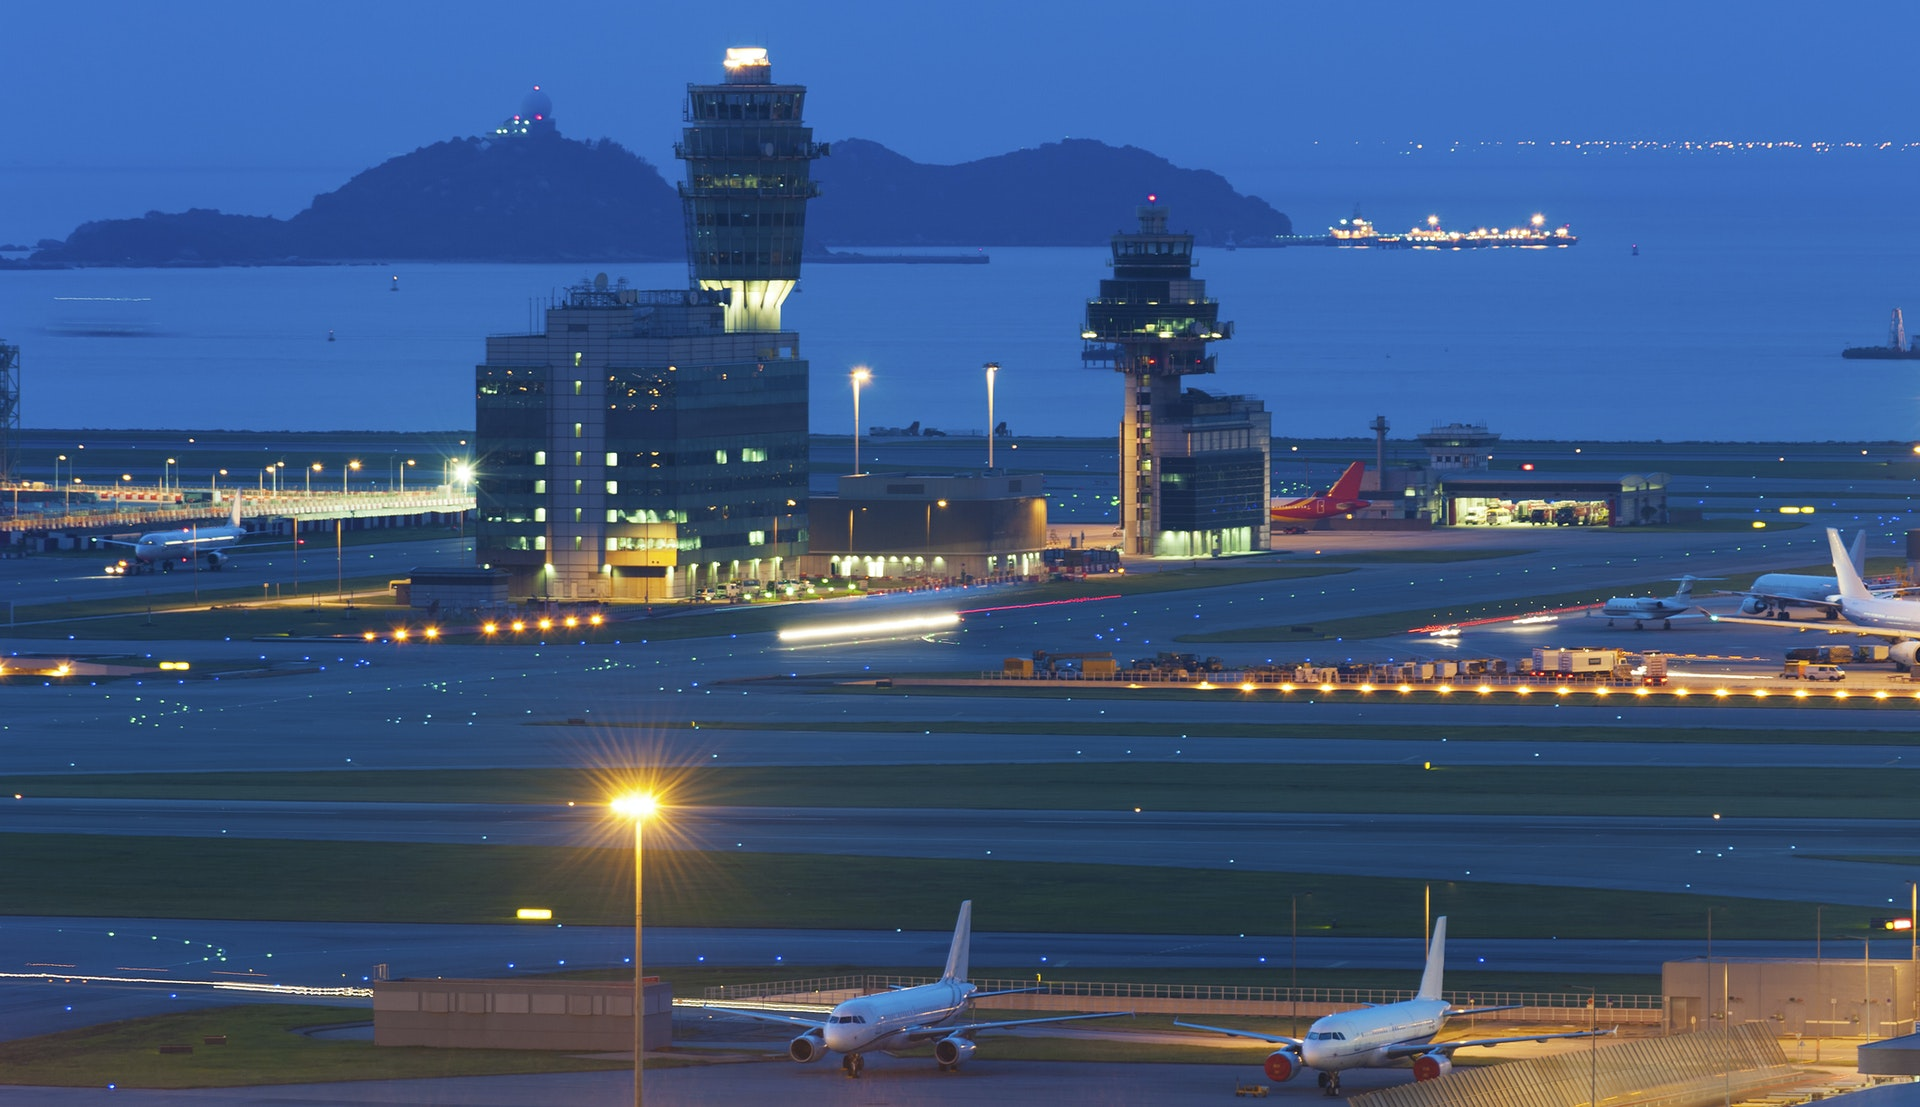 Hong Kong internasjonale lufthavn © Lee Yiu Tung, Getty Images